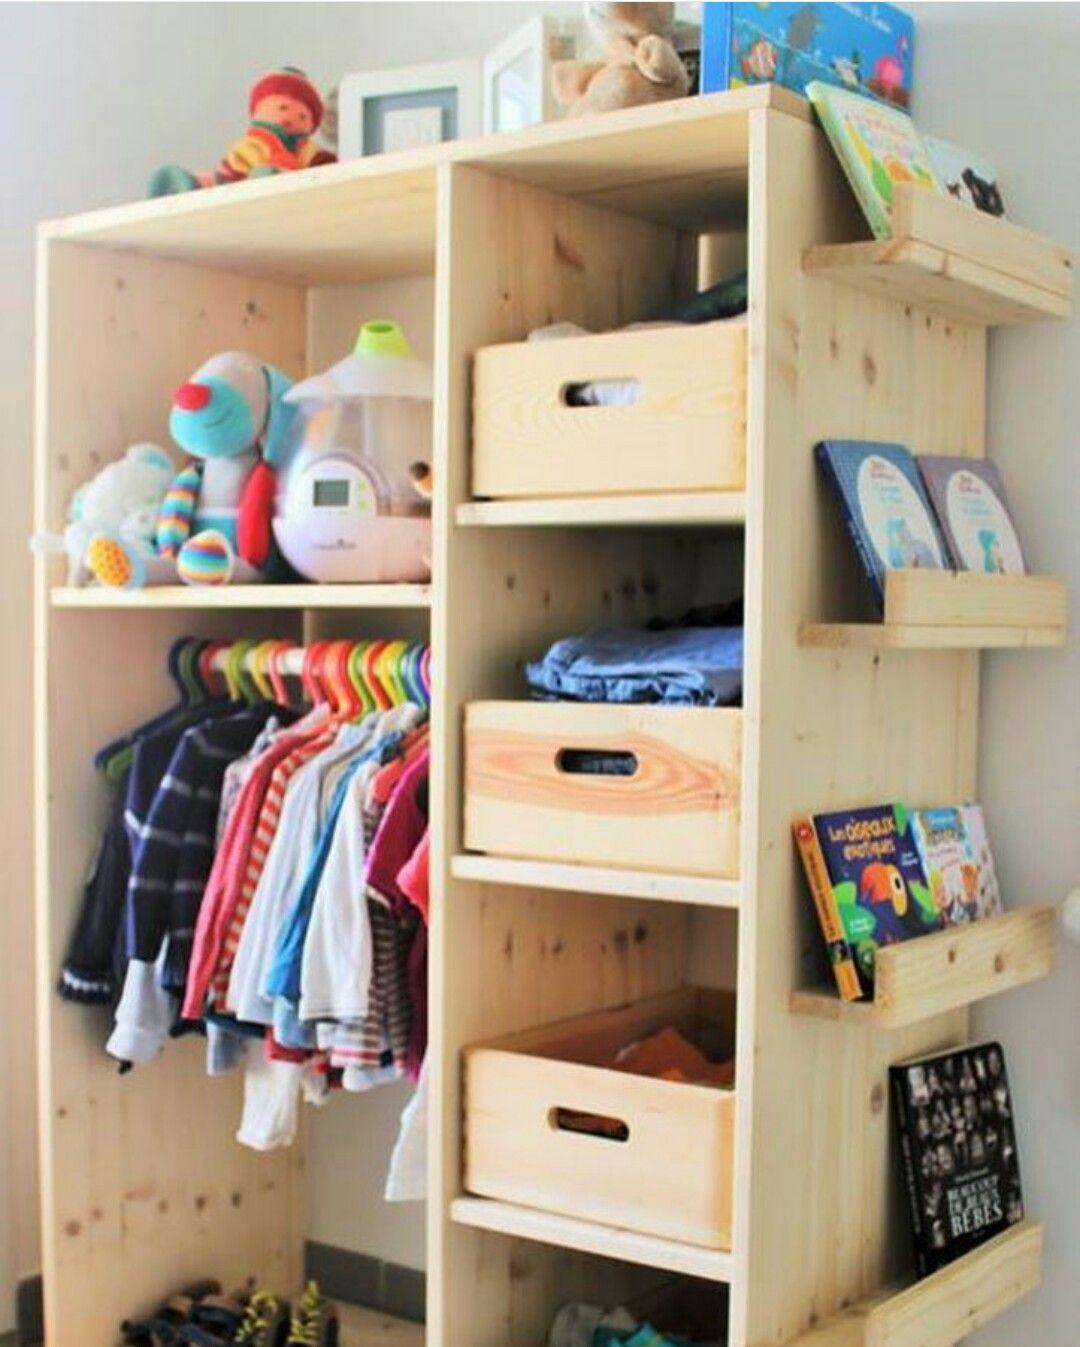 Pin od basia grodecka na pokoje dzieci ce pinterest kinderzimmer schlafzimmer i kinder zimmer - Kleinkind zimmer ...